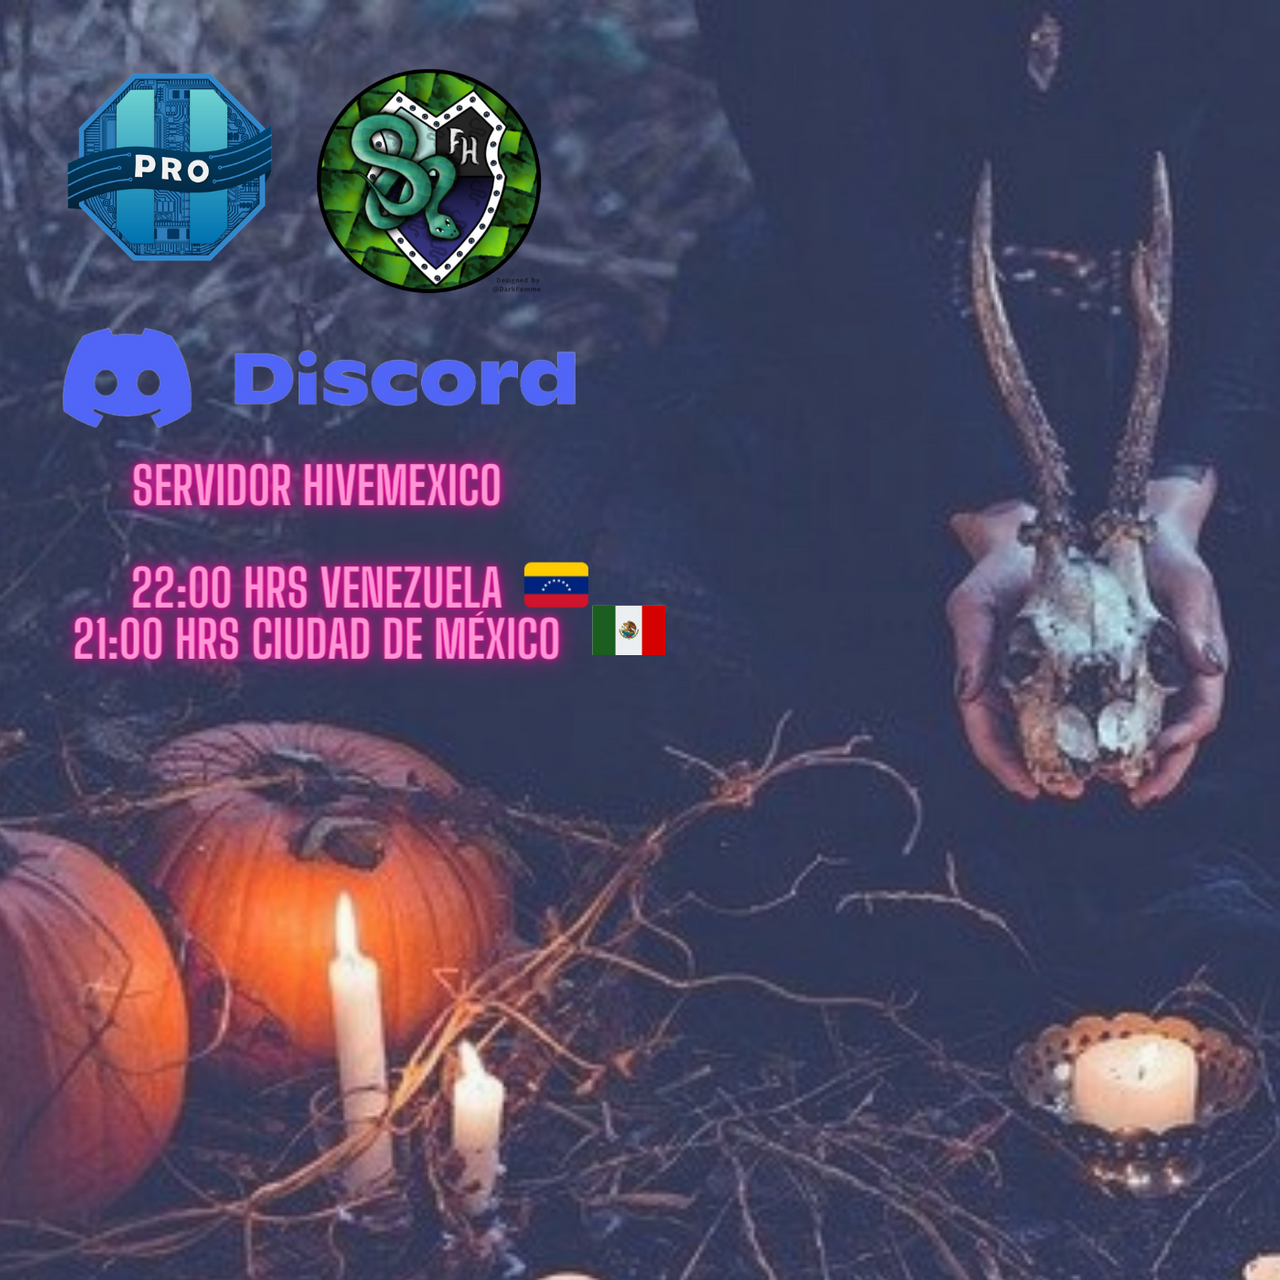 SERVIDOR HIVEMEXICO 2200 HRS VENEZUELA 2100 HRS CIUDAD DE MÉXICO.png